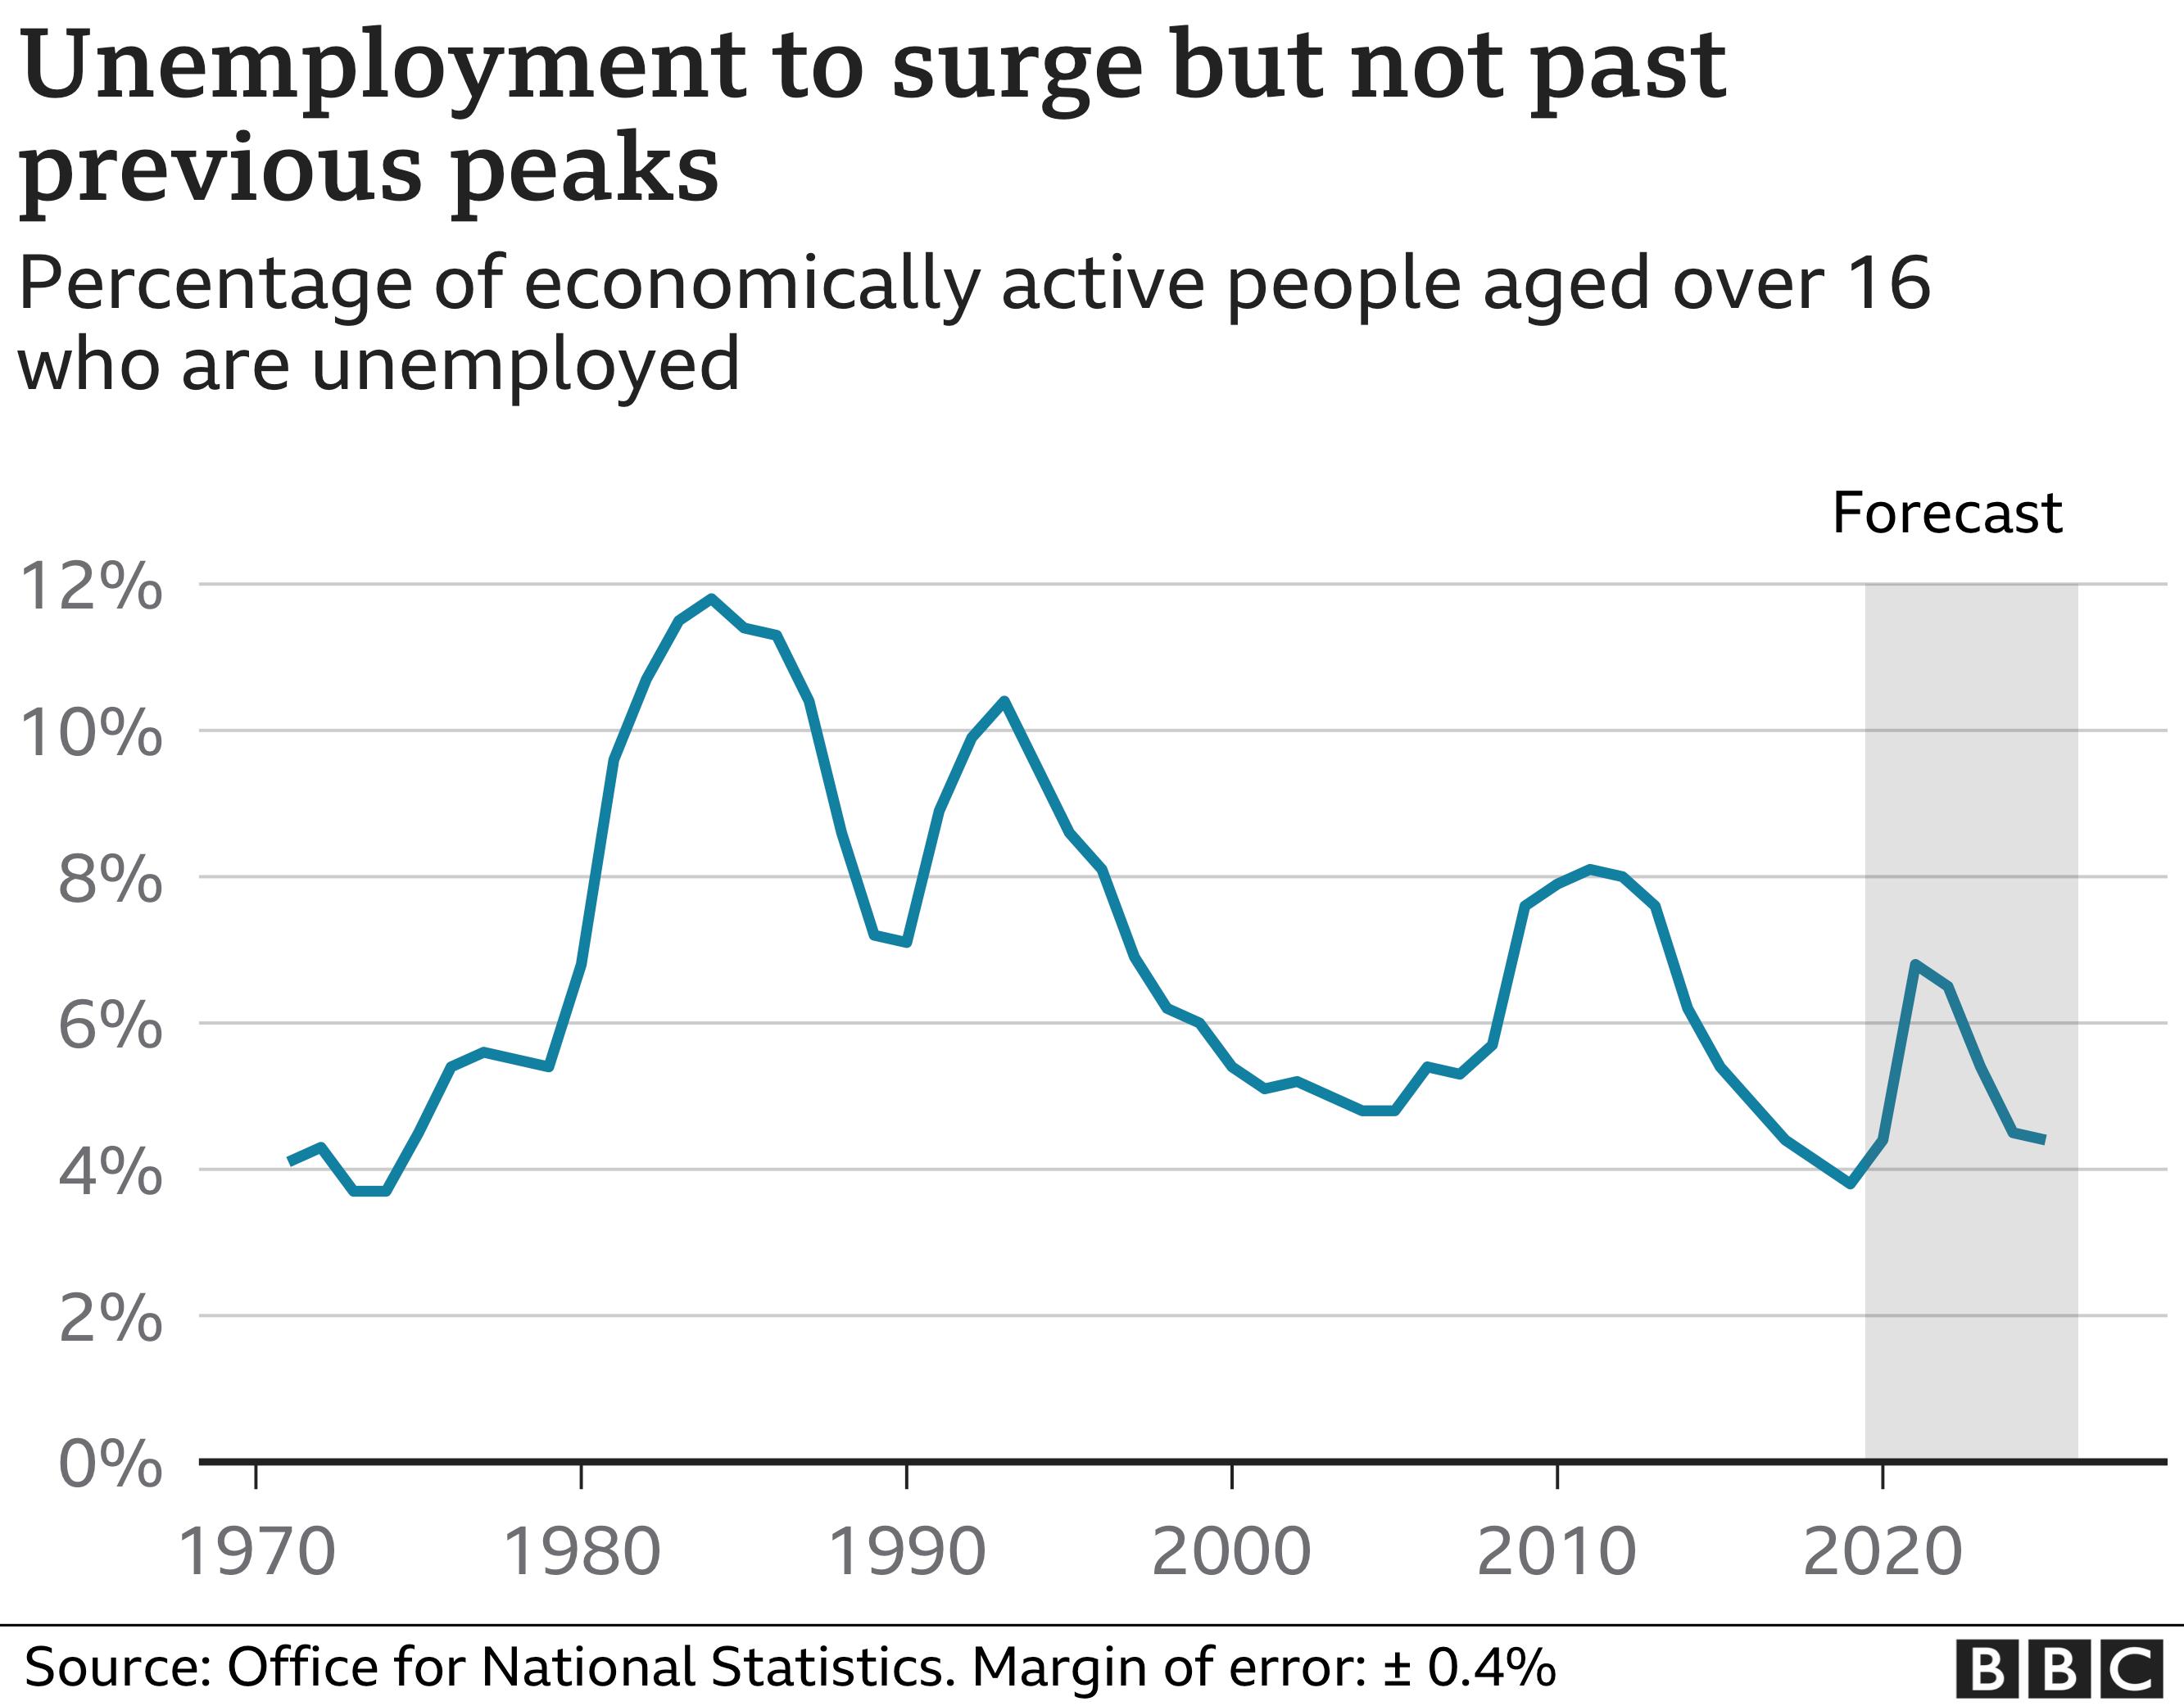 OBR Unemployment forecast